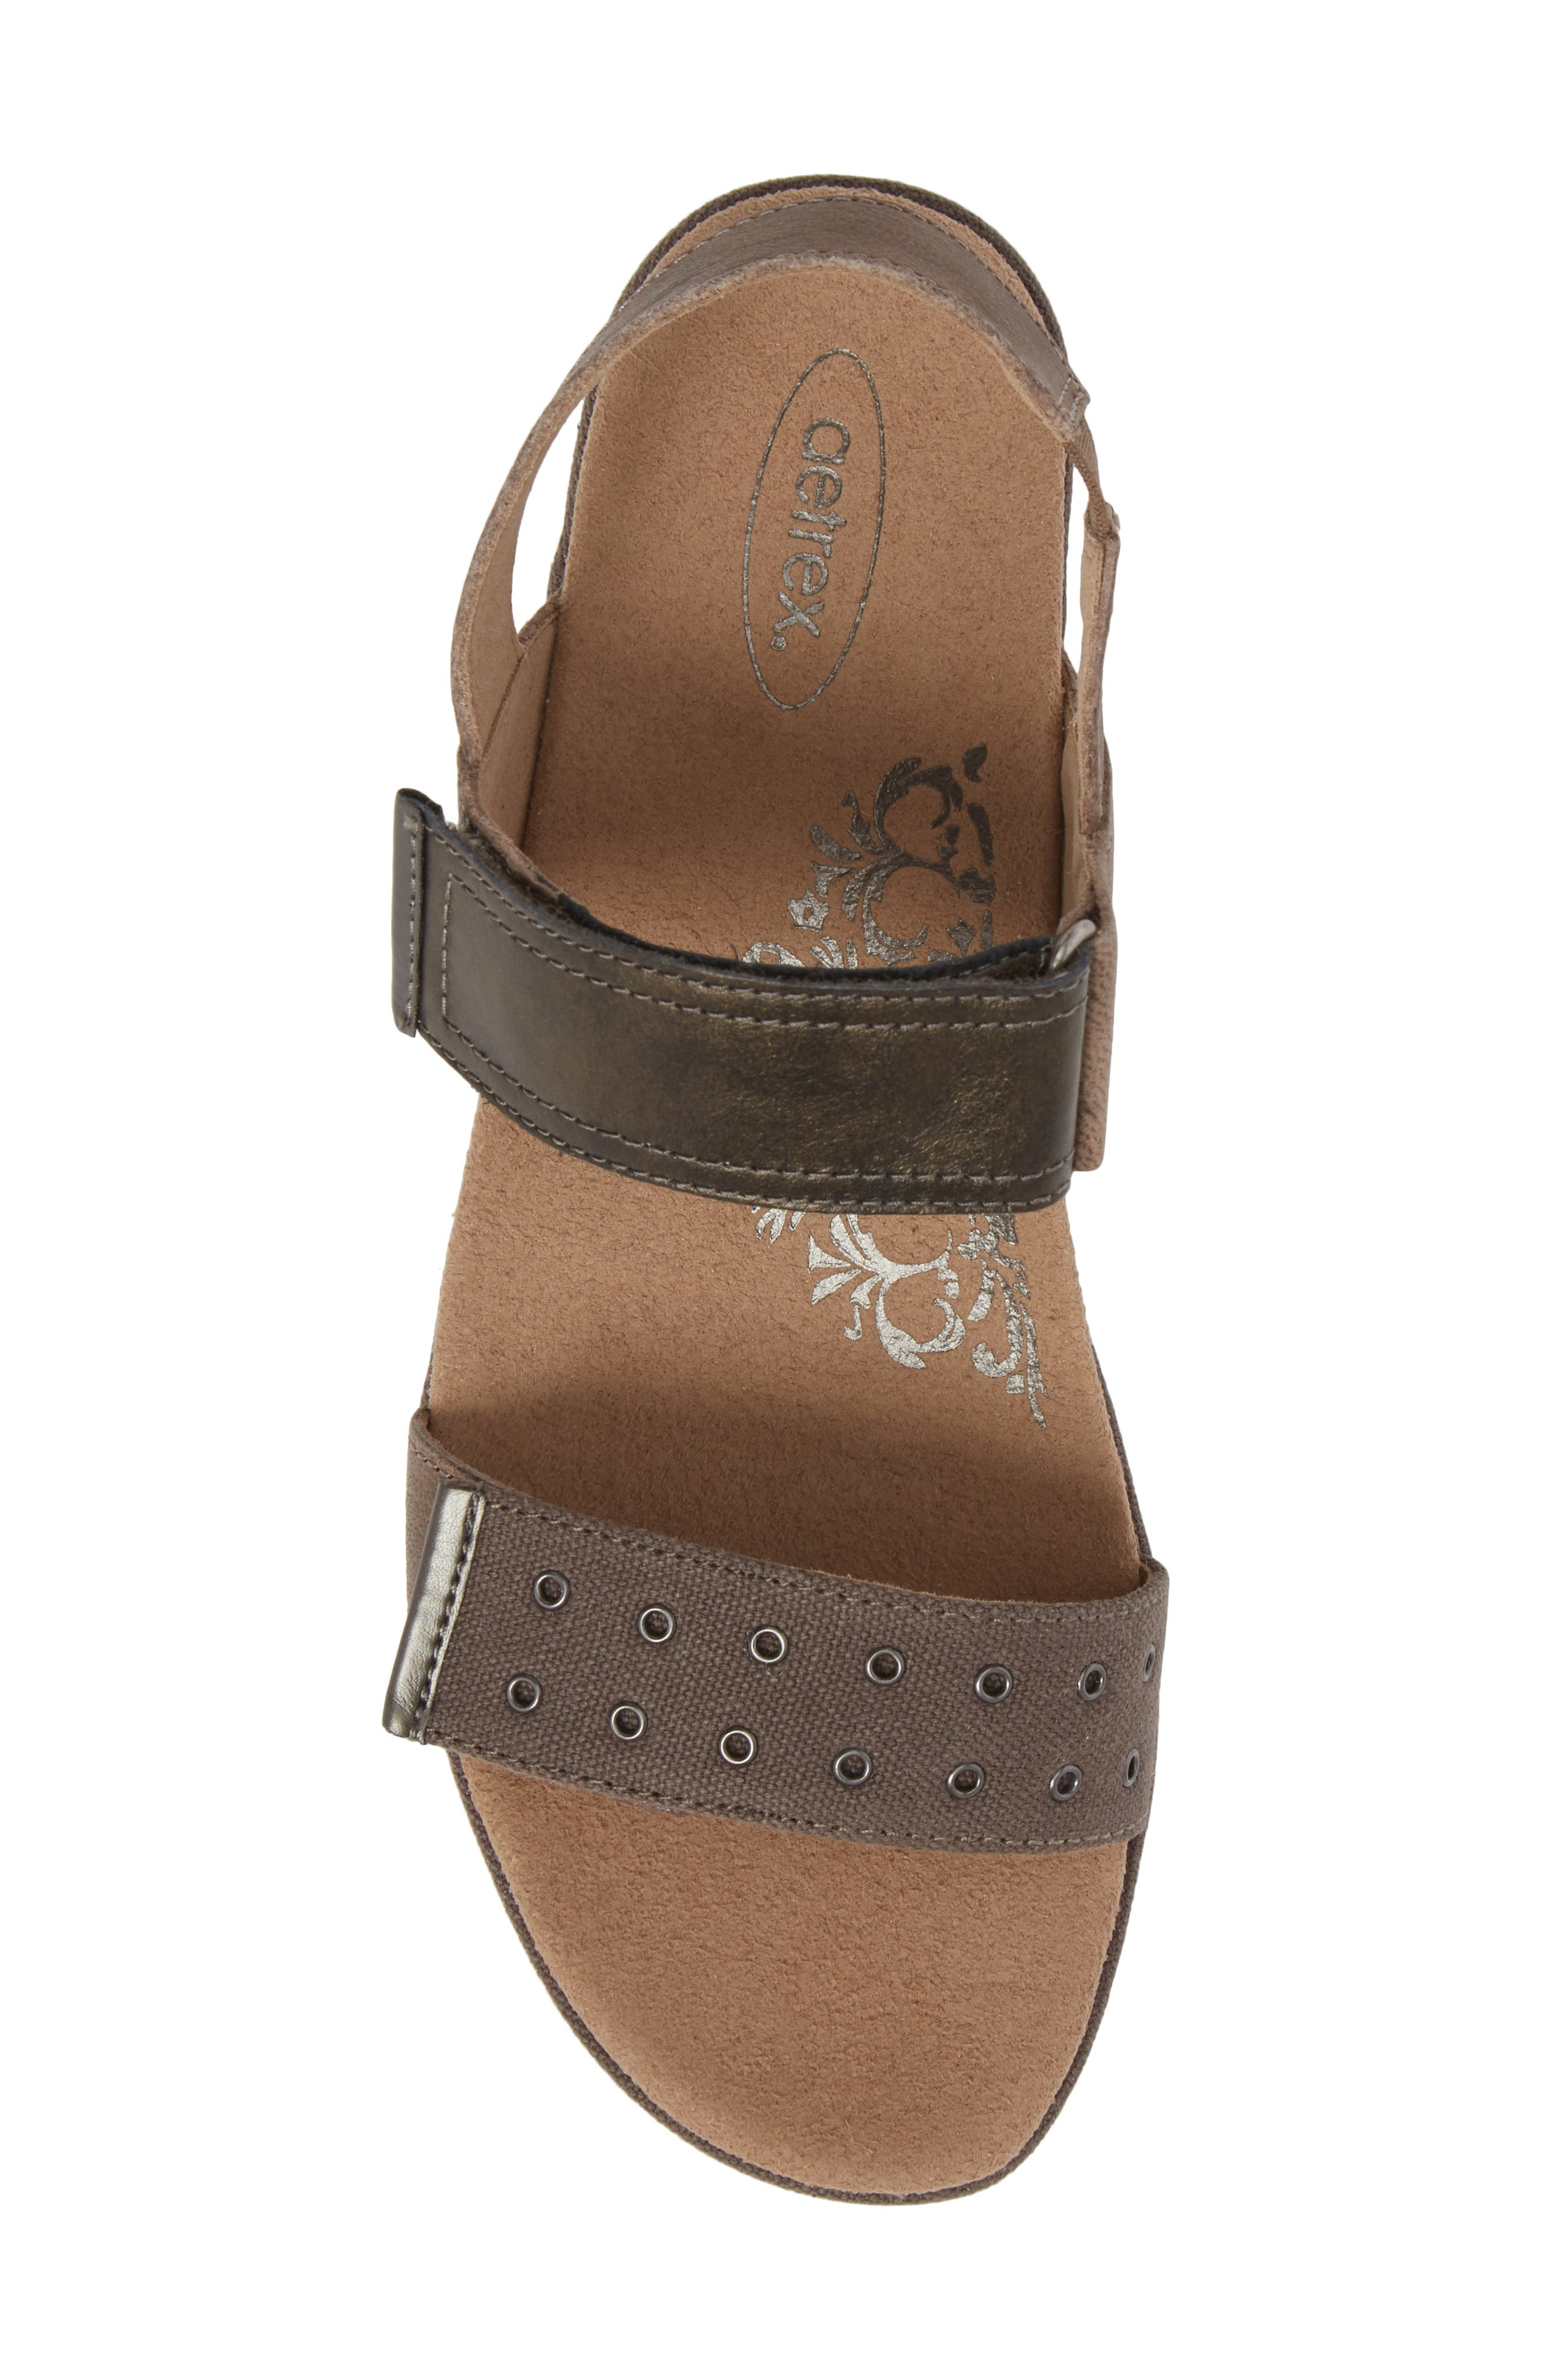 Tiffany Wedge Sandal,                             Alternate thumbnail 5, color,                             Stone Leather